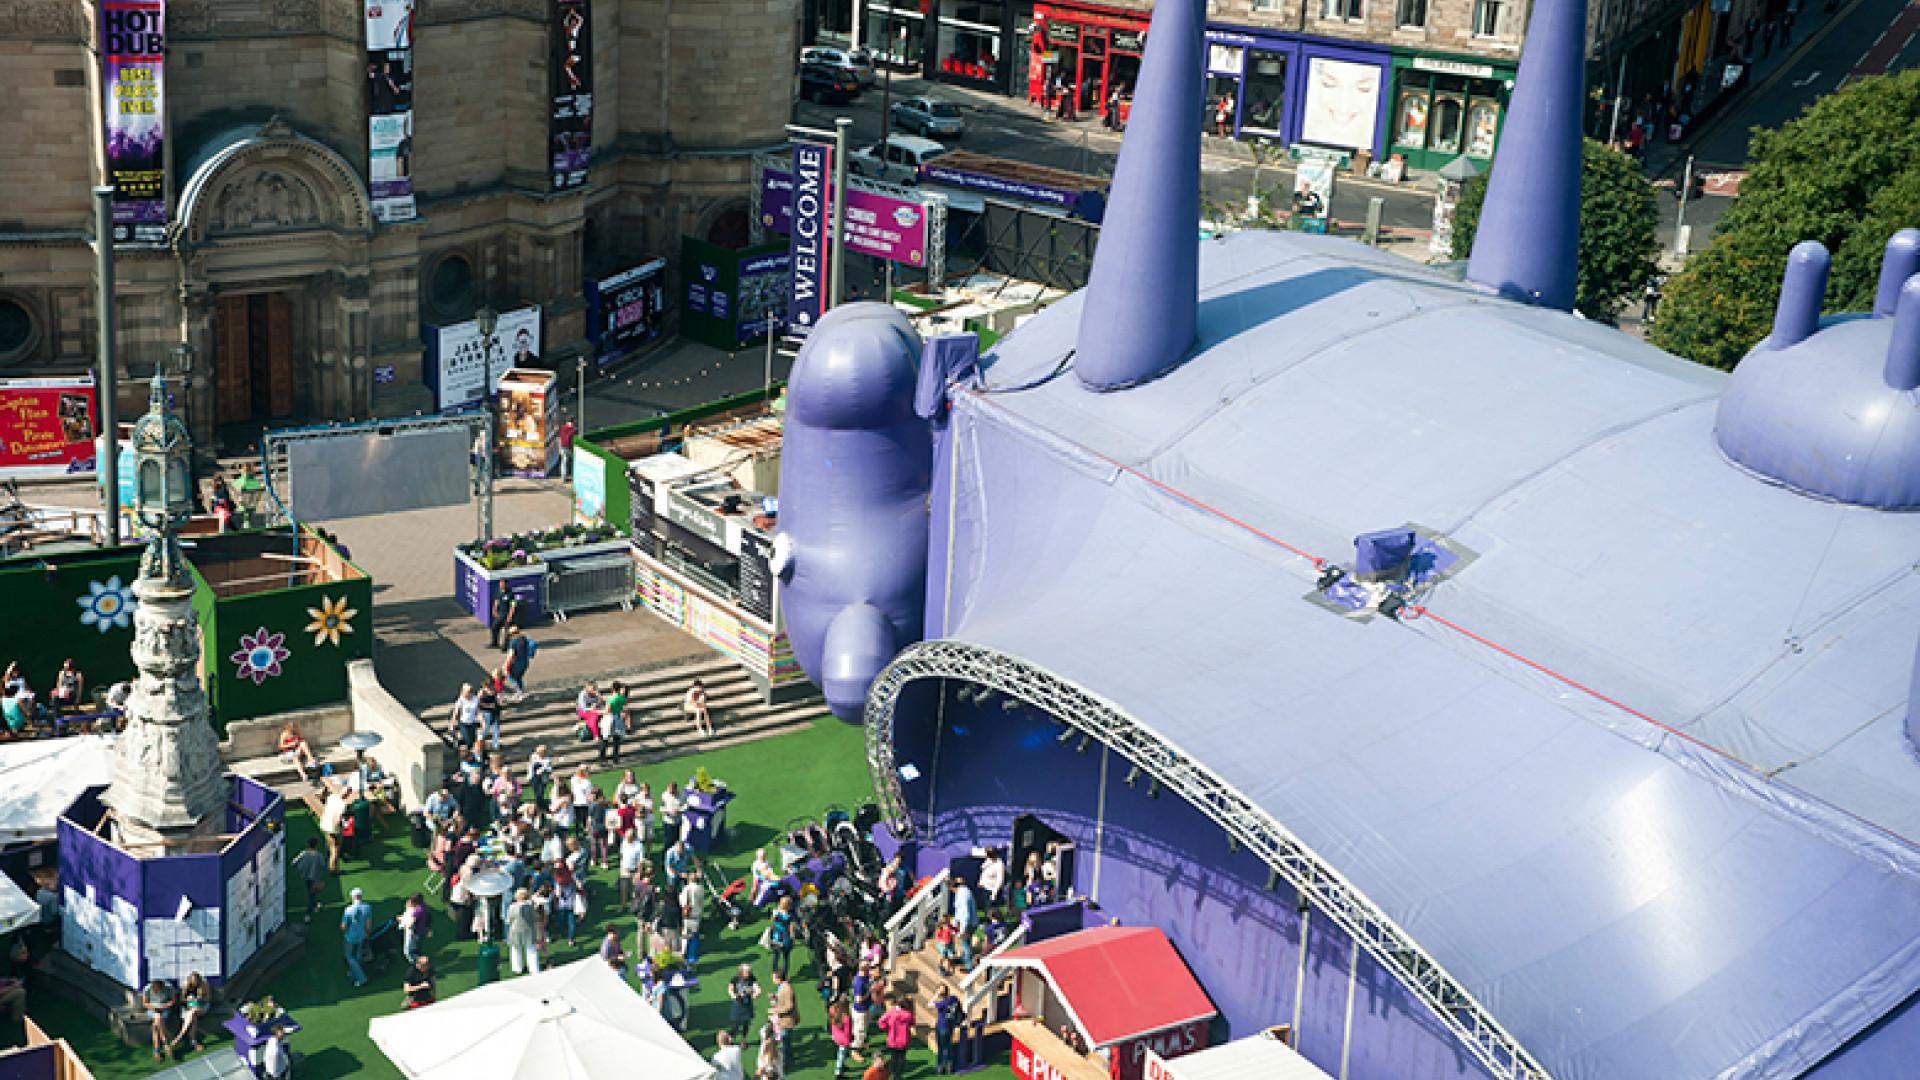 Edinburgh-Festival-Fringe---Bristo-Square